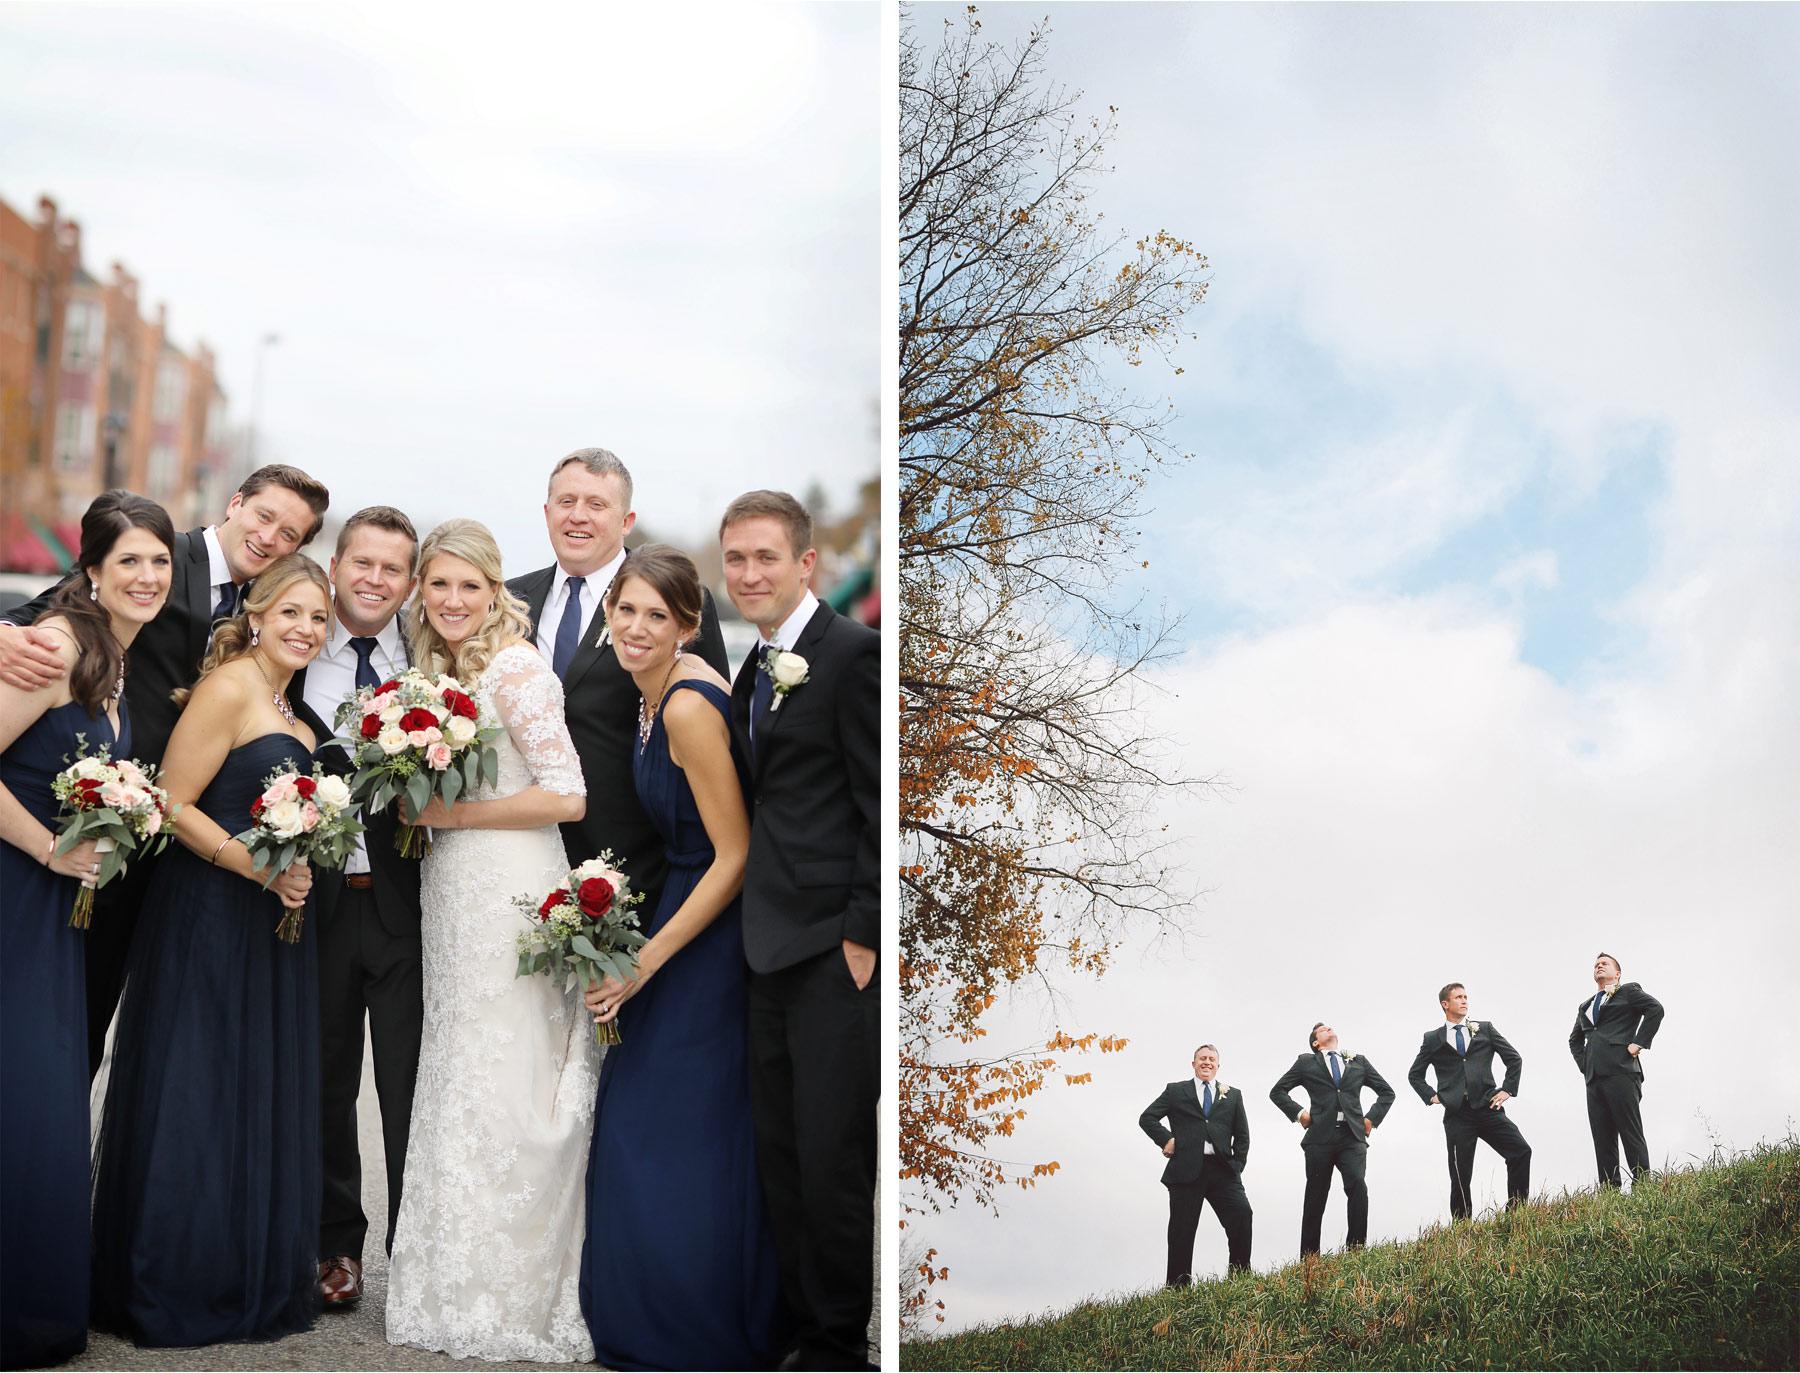 10-Shakopee-Minnesota-Wedding-Photography-by-Vick-Photography-Bridesmaids-Groomsmen-Amber-and-Justin.jpg